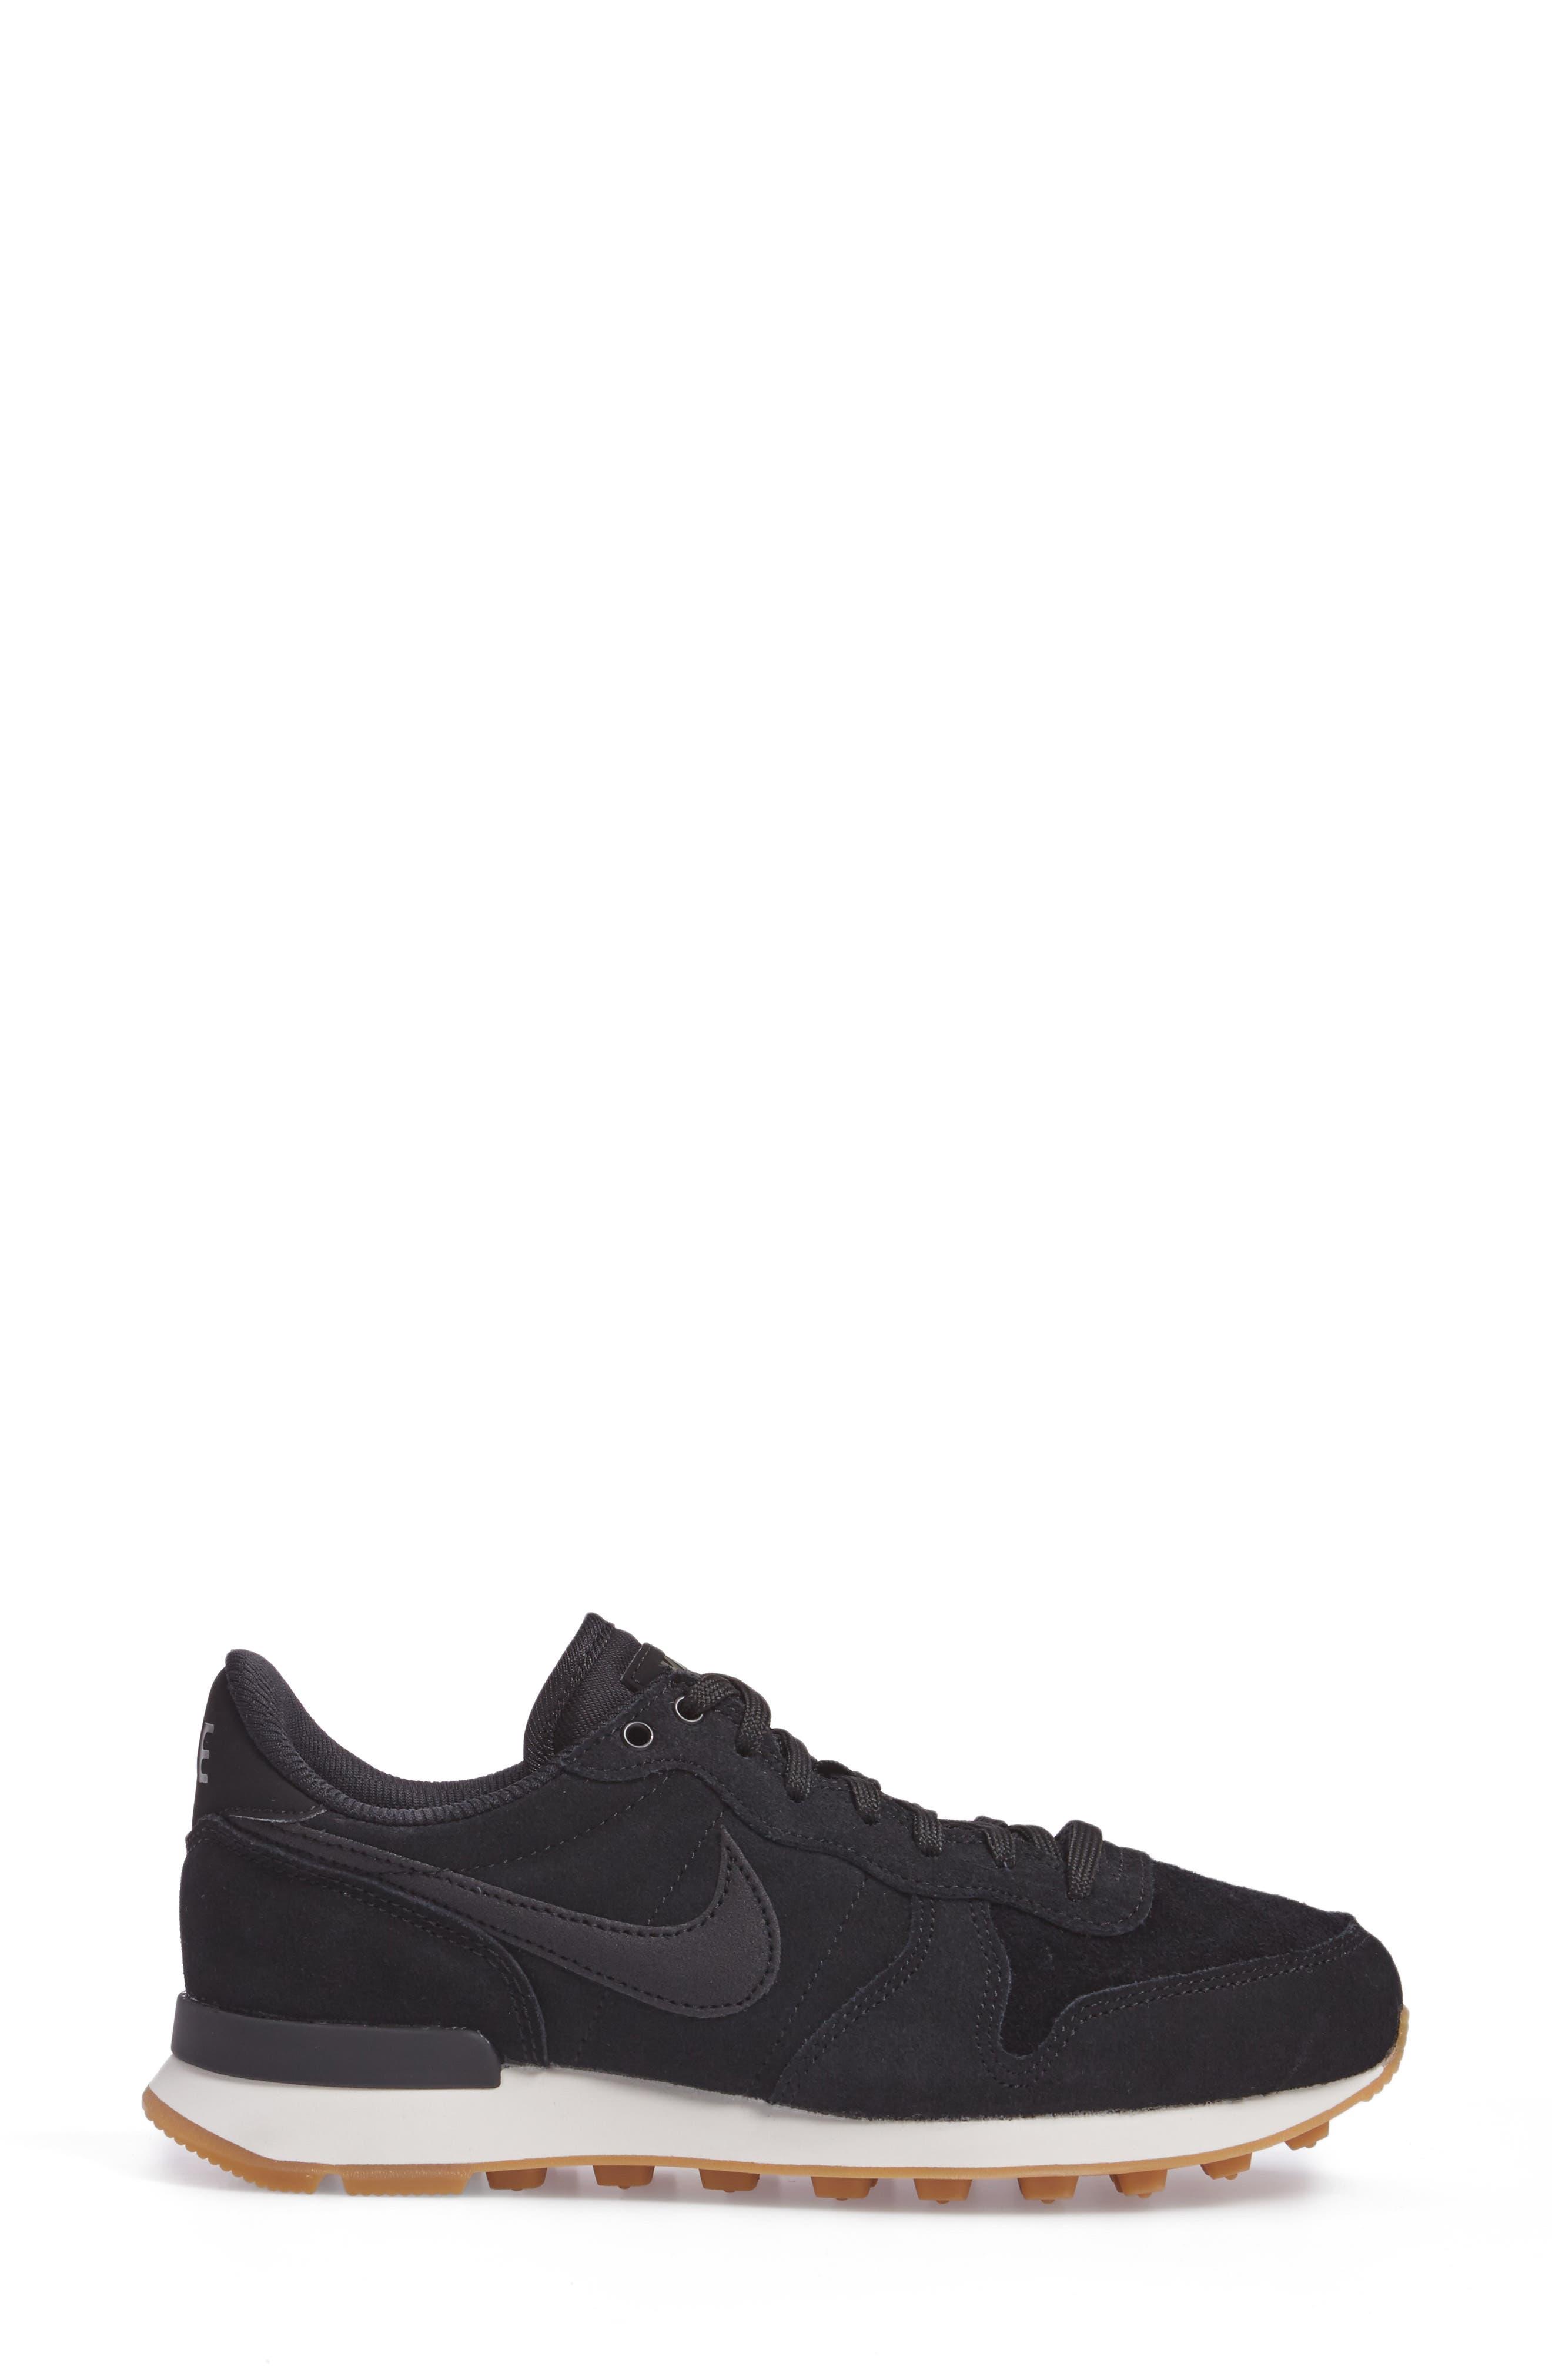 Internationalist SE Sneaker,                             Alternate thumbnail 3, color,                             002